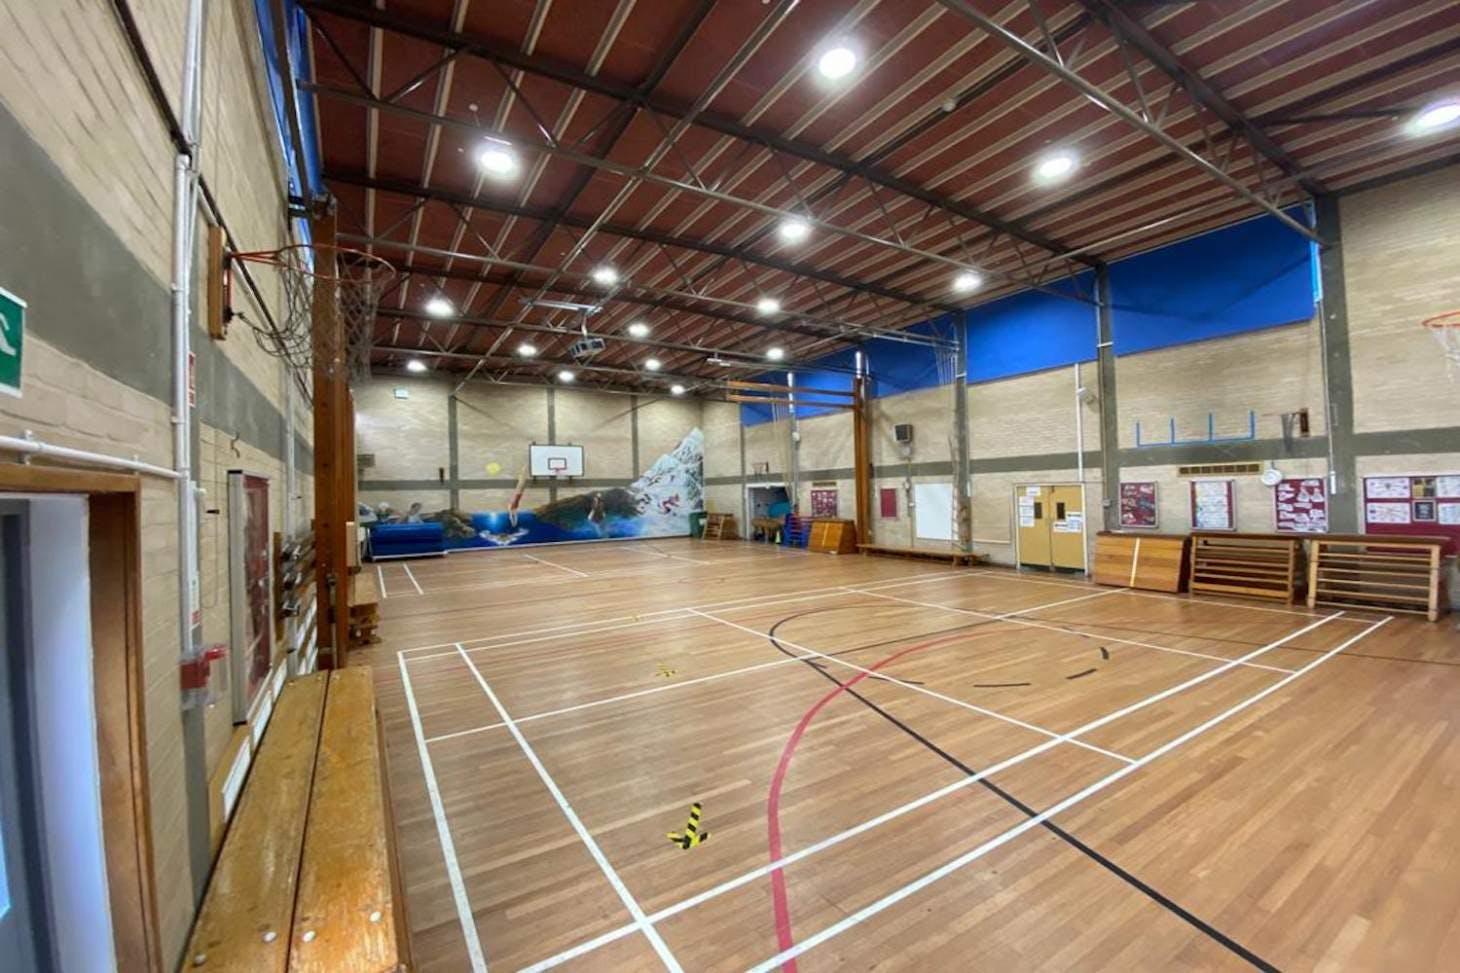 La Sainte Union School Court | Sports hall badminton court